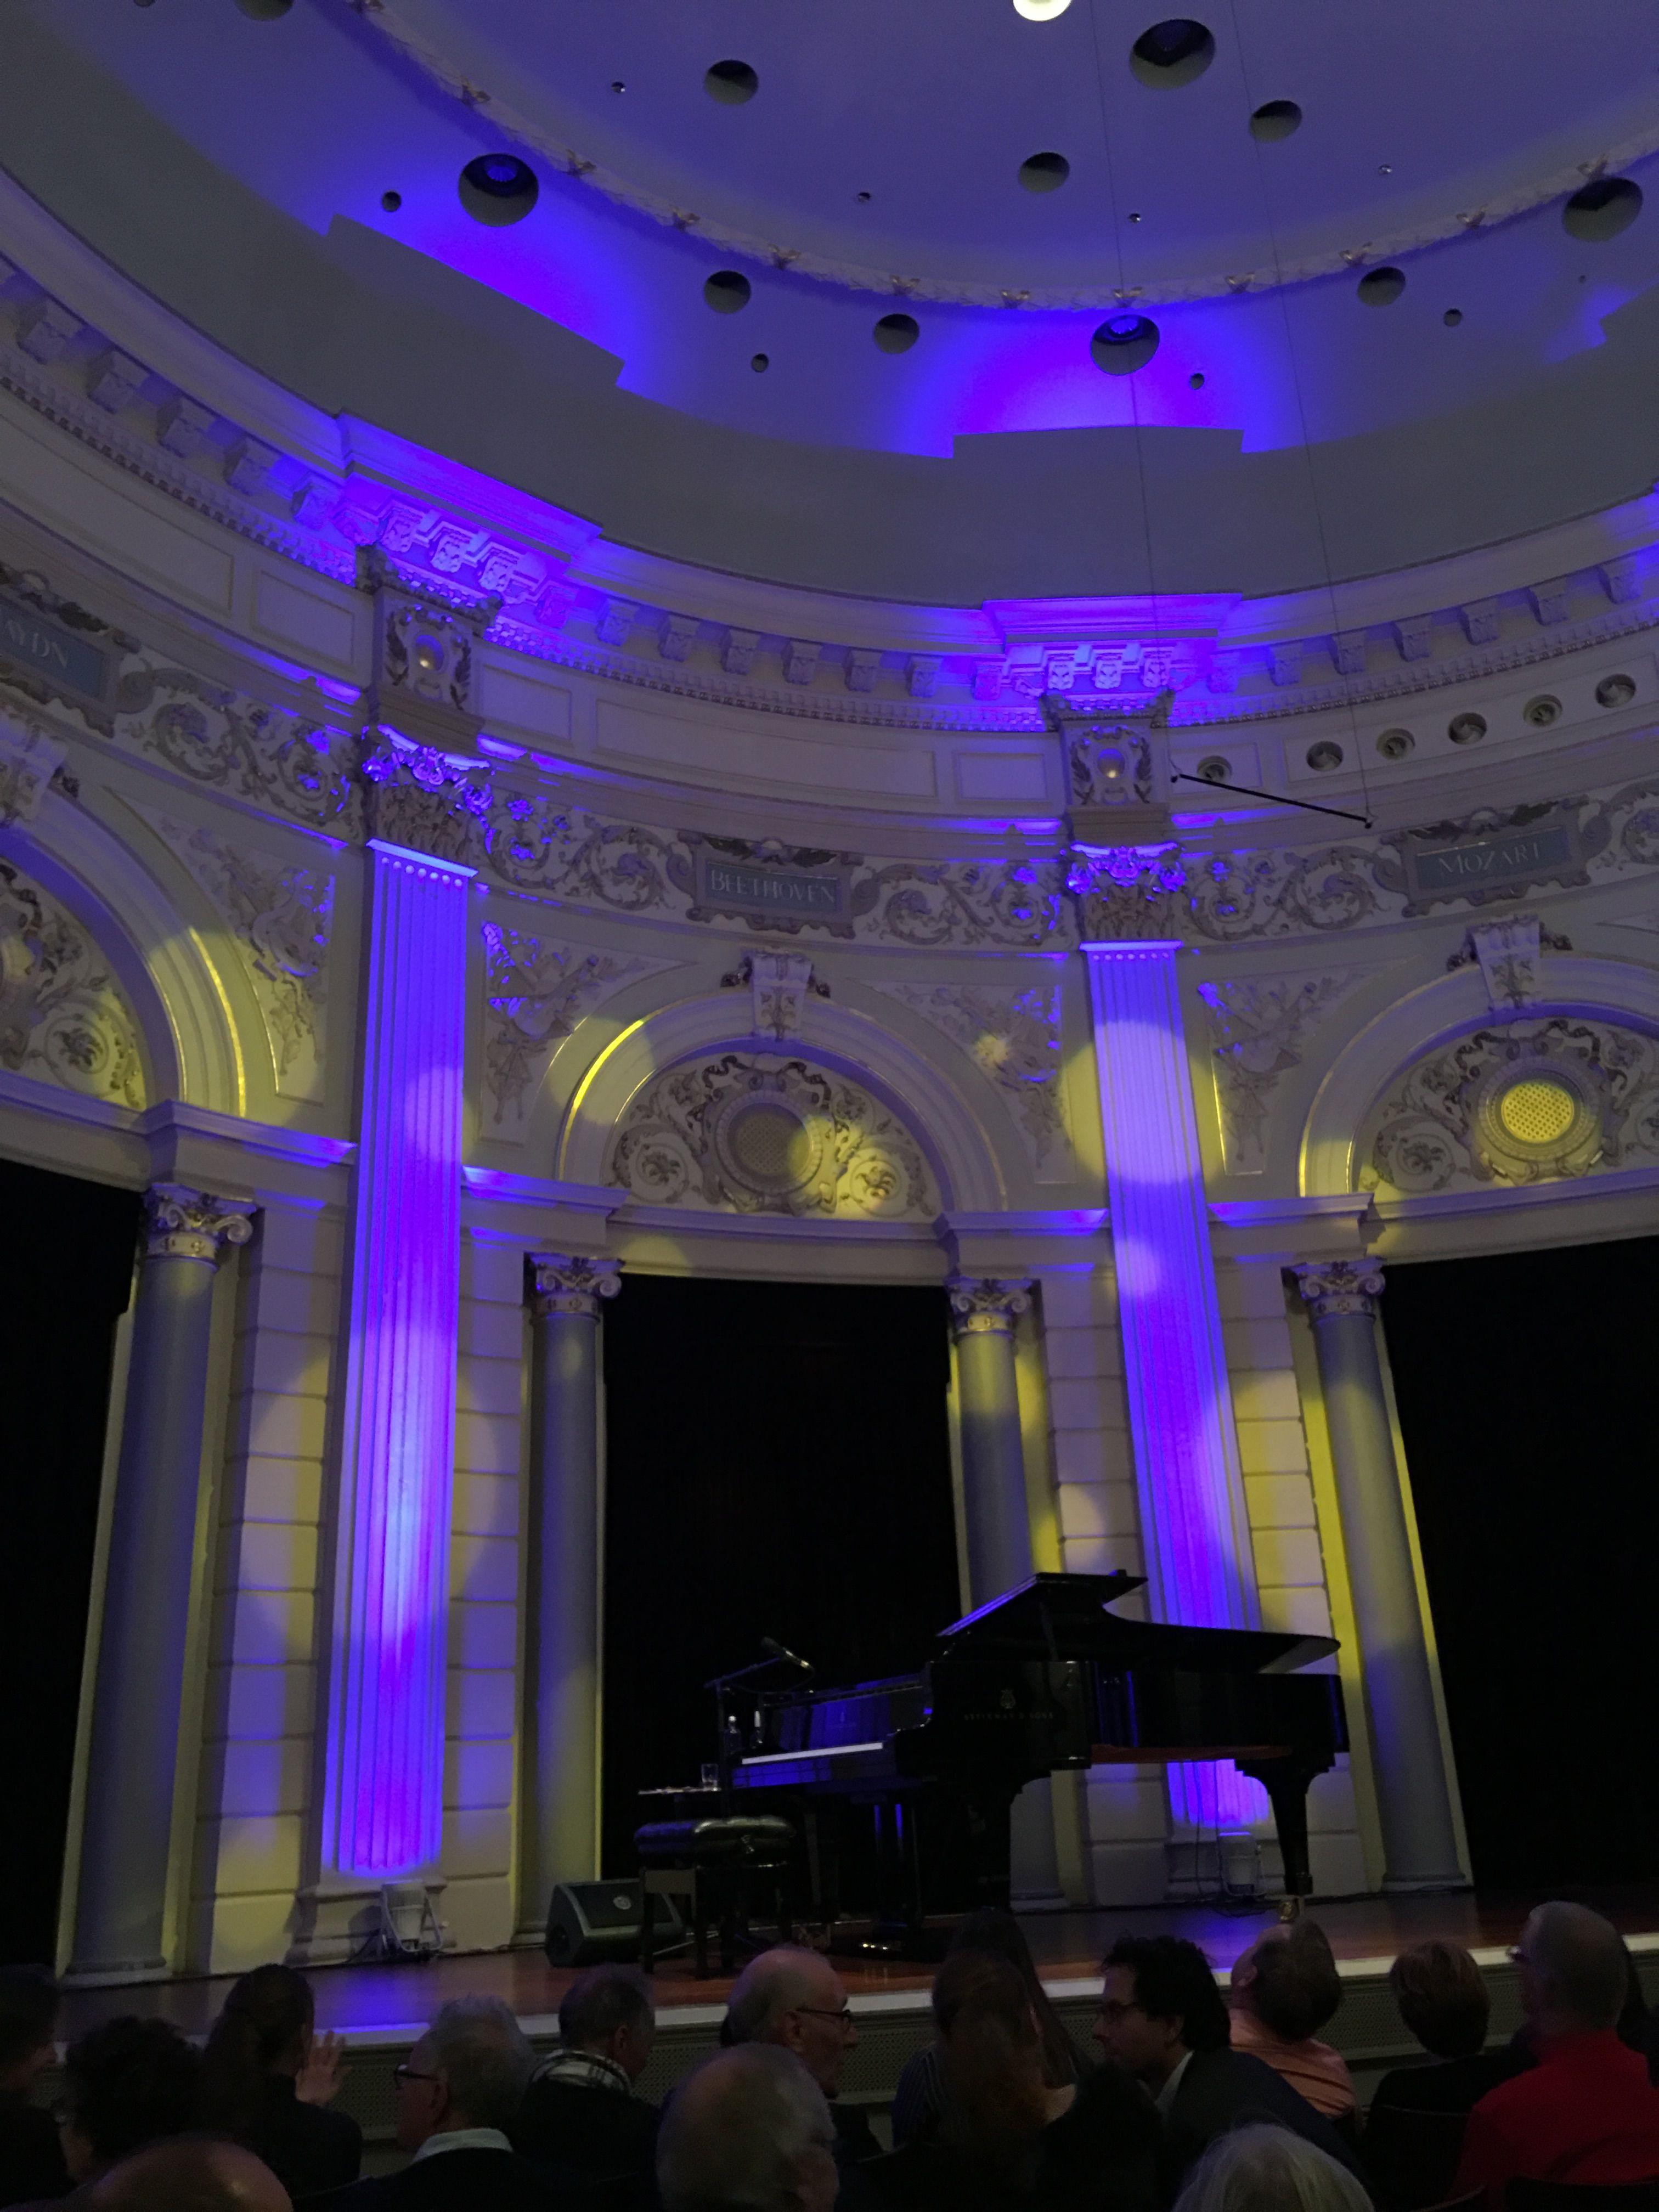 Juliette. Pauze. Concertgebouw.